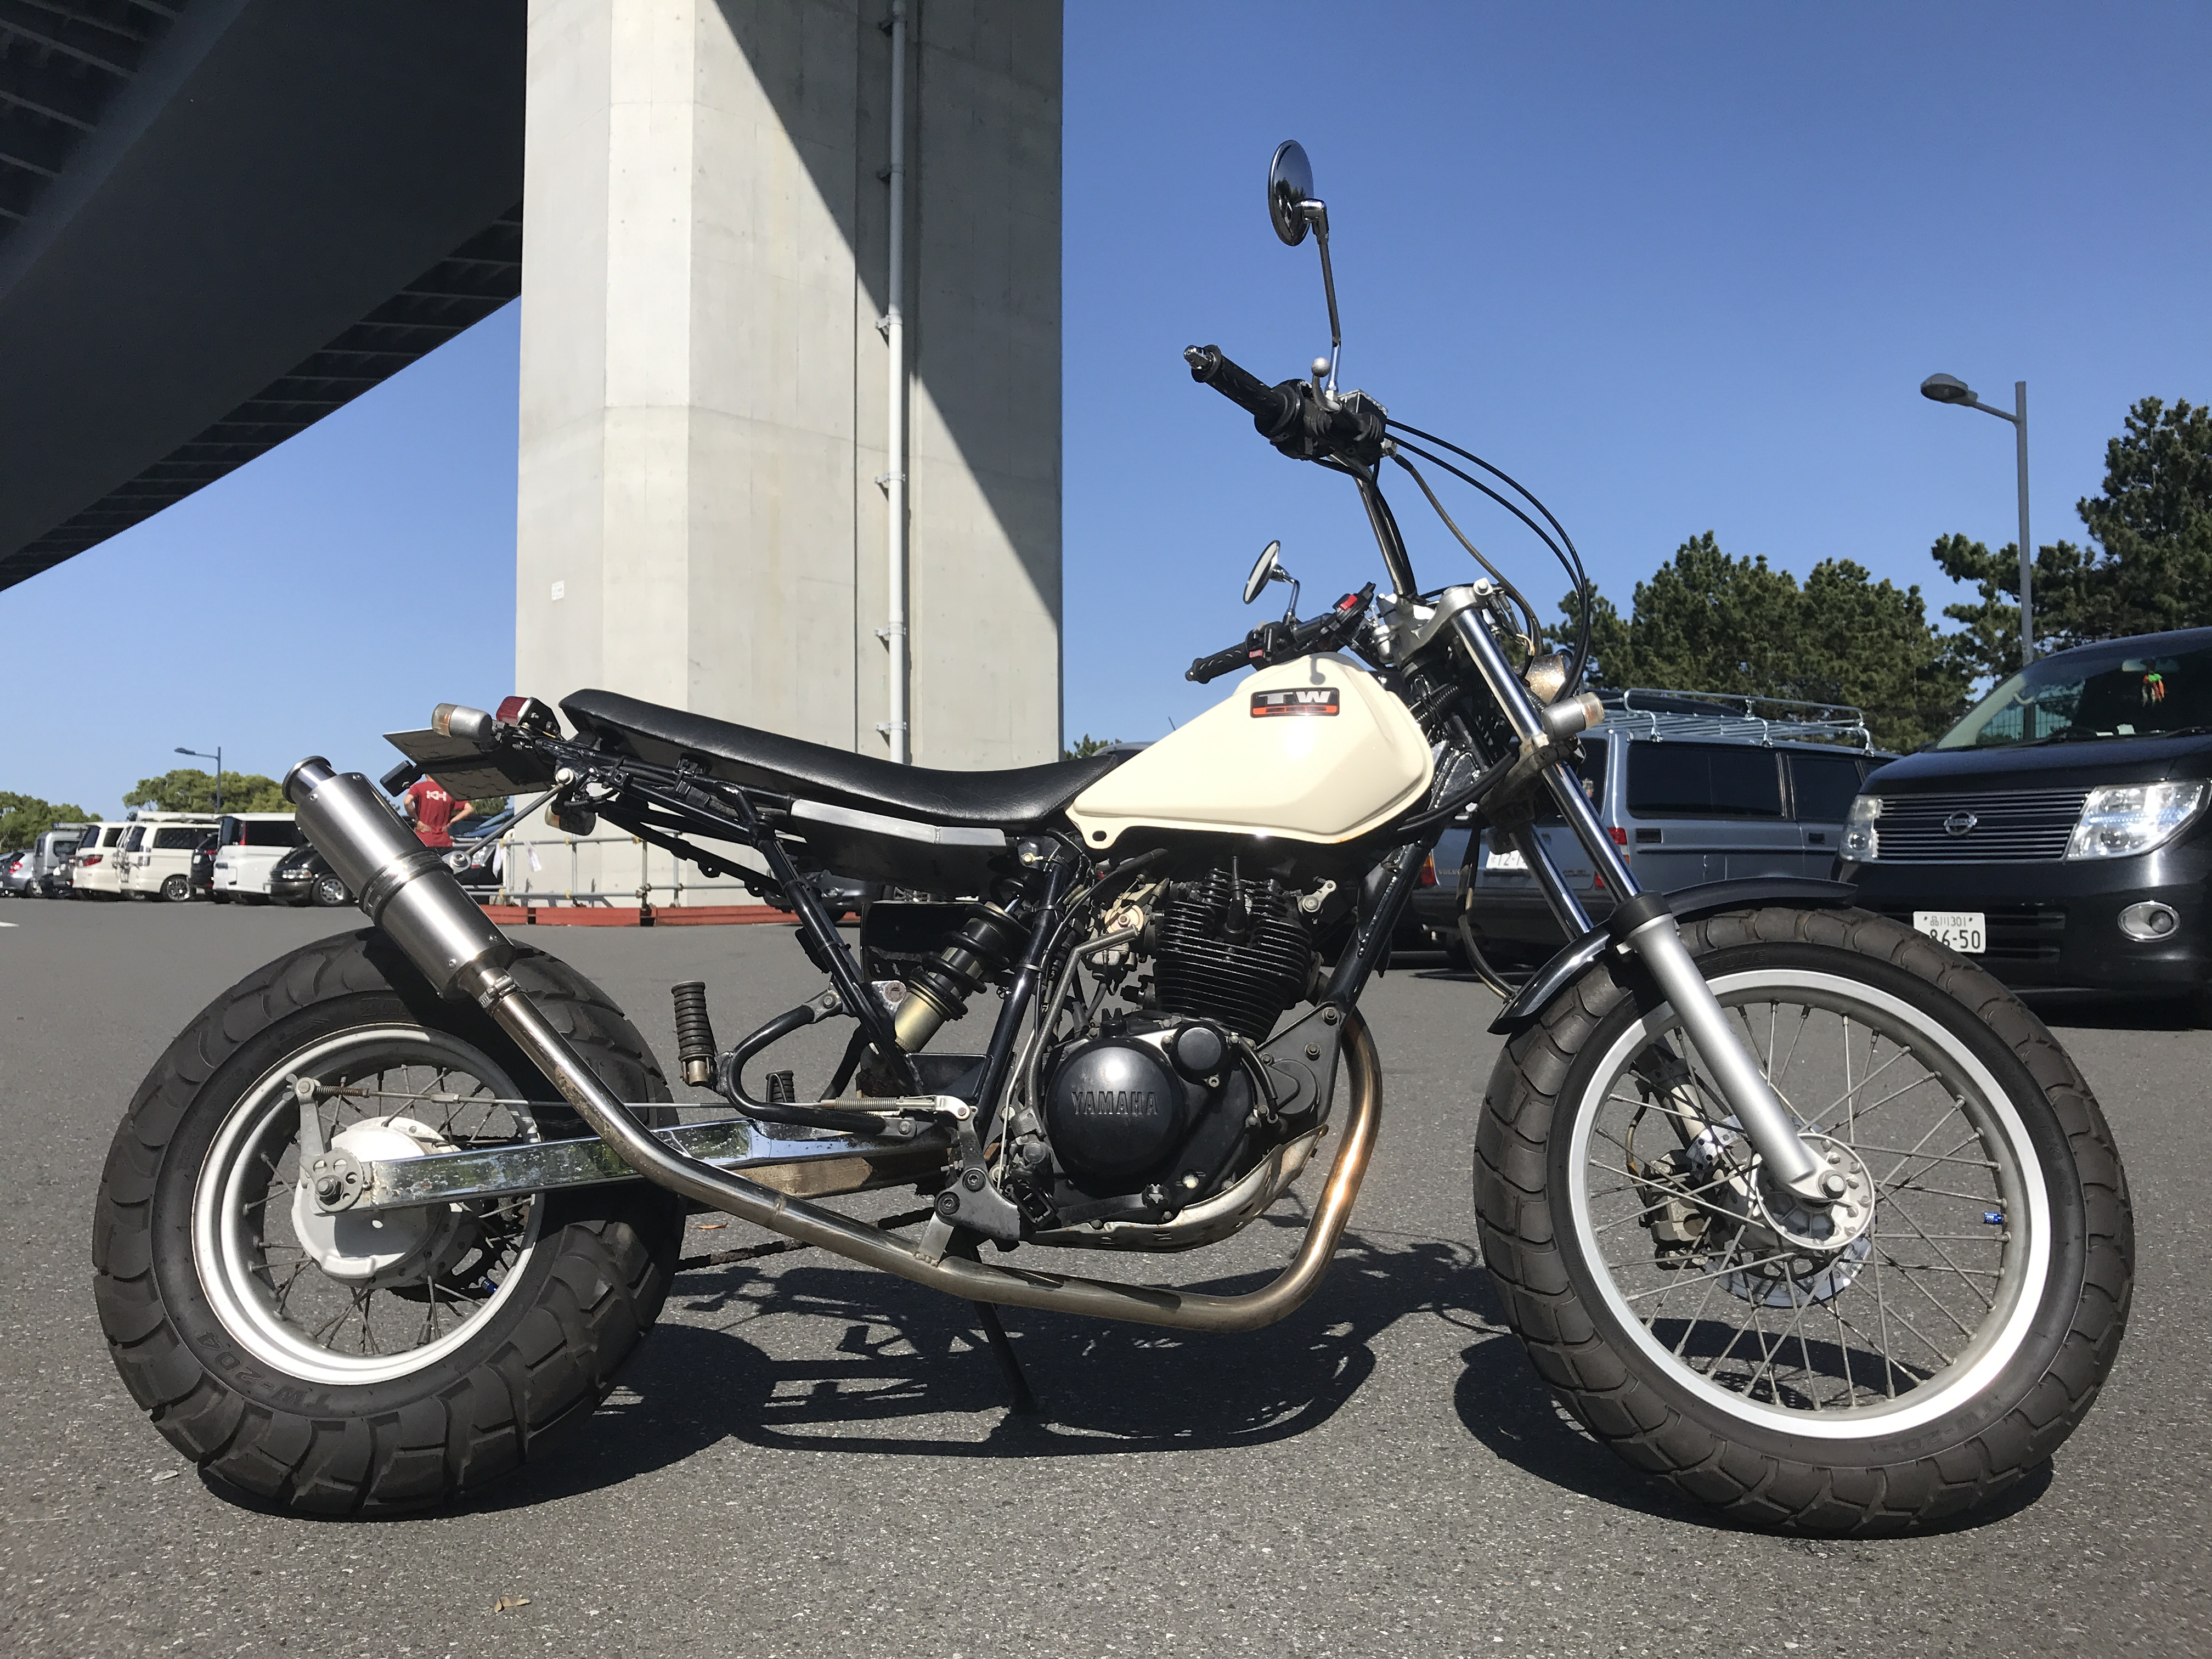 TW225カスタム (HN-00) - 【公式】レンタルバイクのベストBike® 八王子駅前